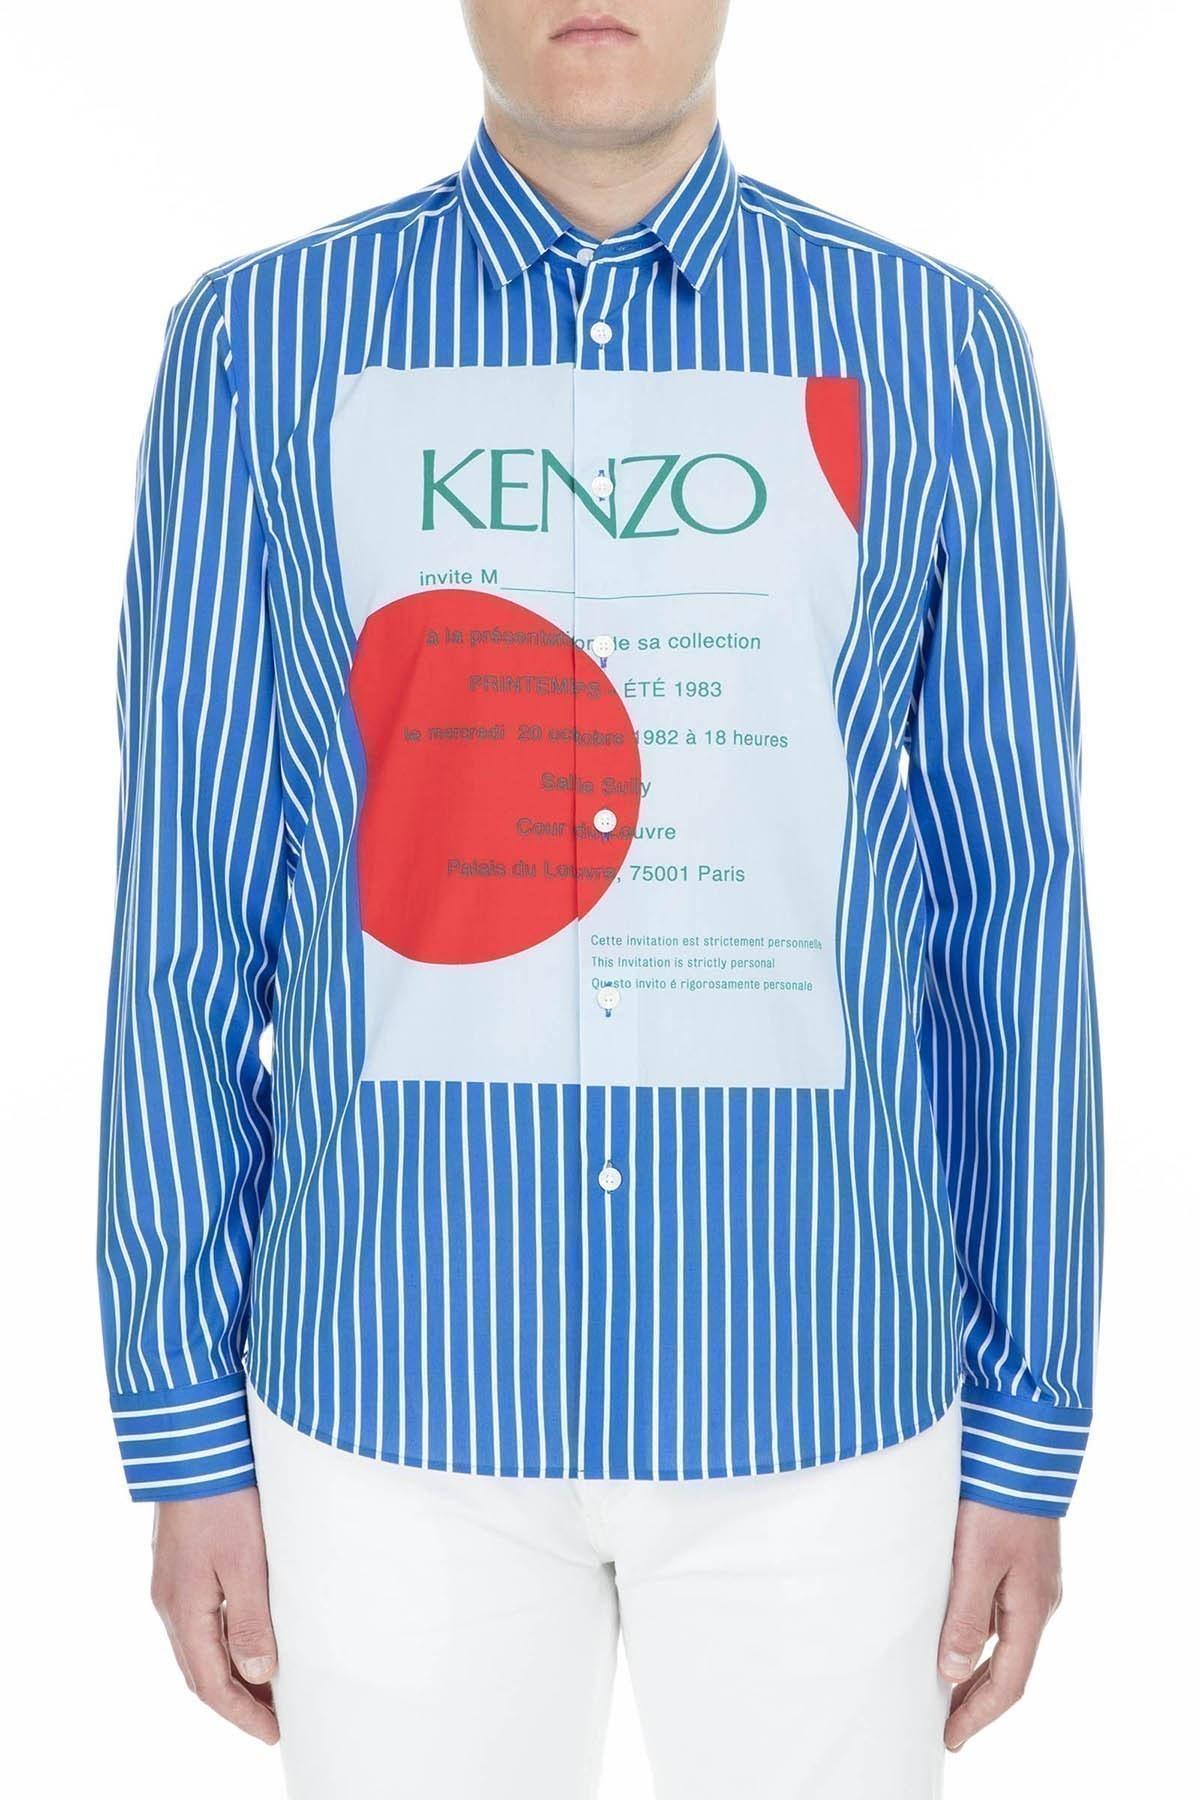 Kenzo Erkek Gömlek F95 5CH224 1KL 70 SAKS